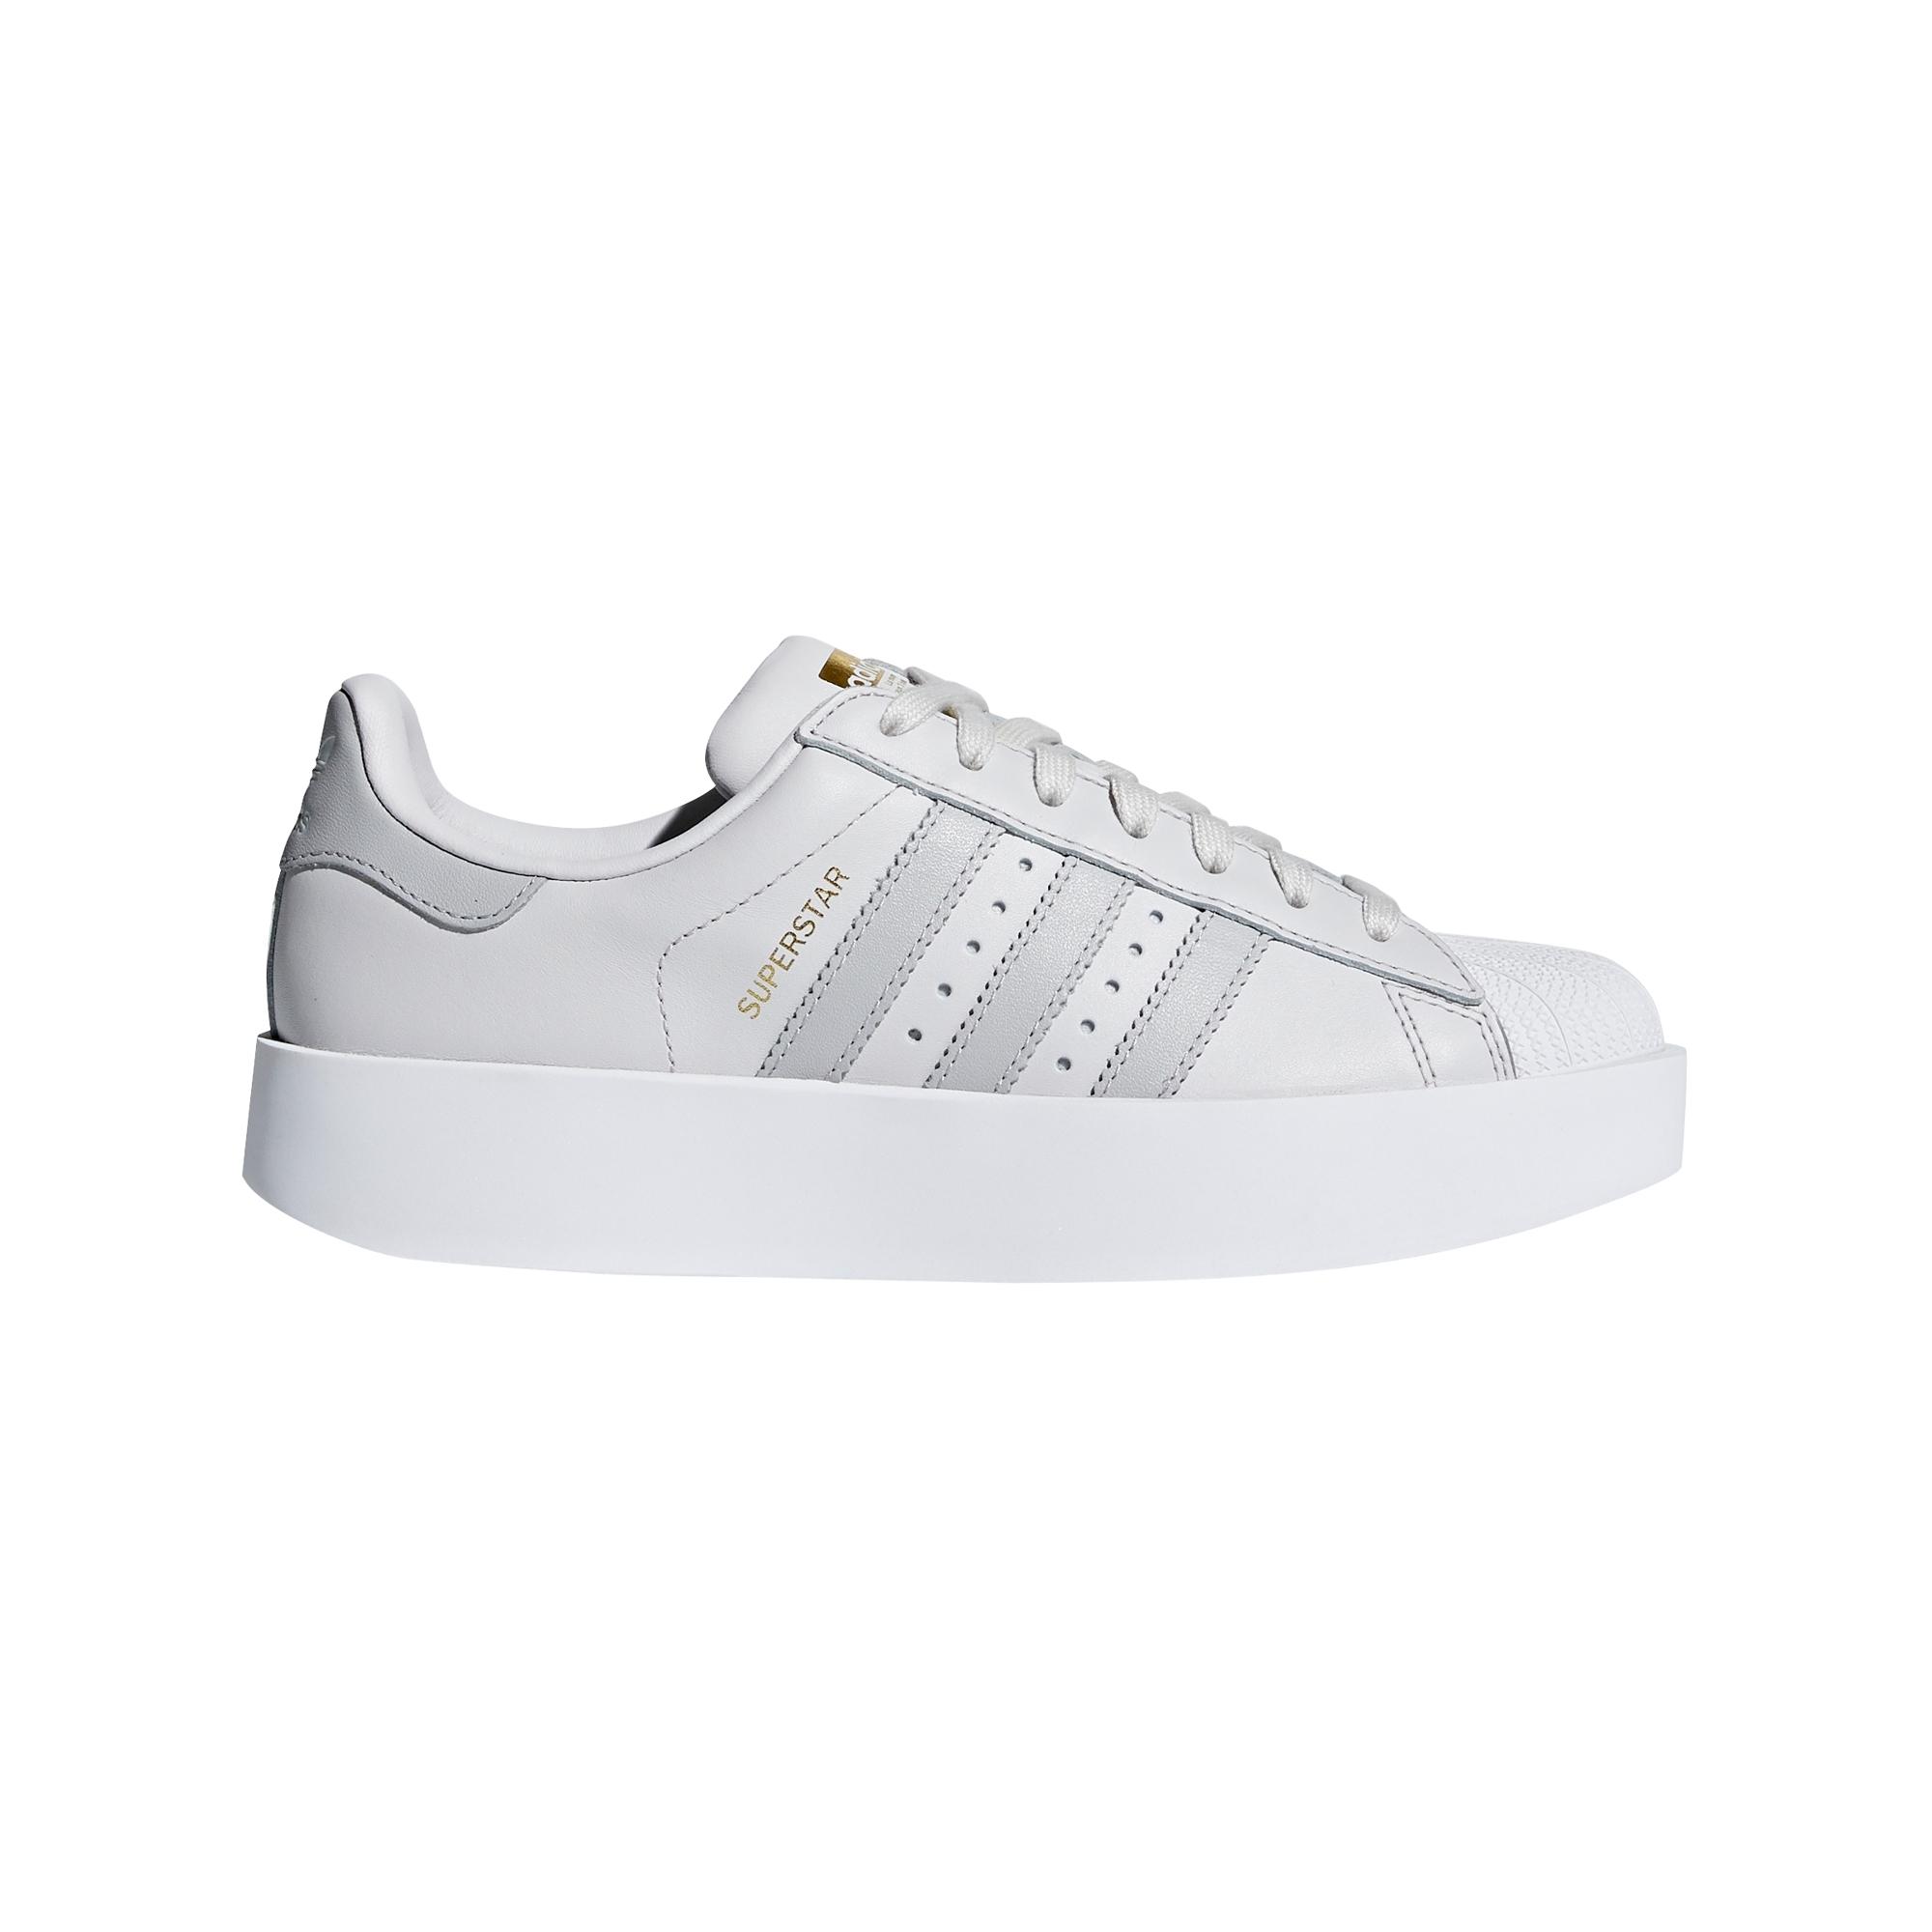 a5128a40d69ed Adidas Originals Superstar Bold Platform